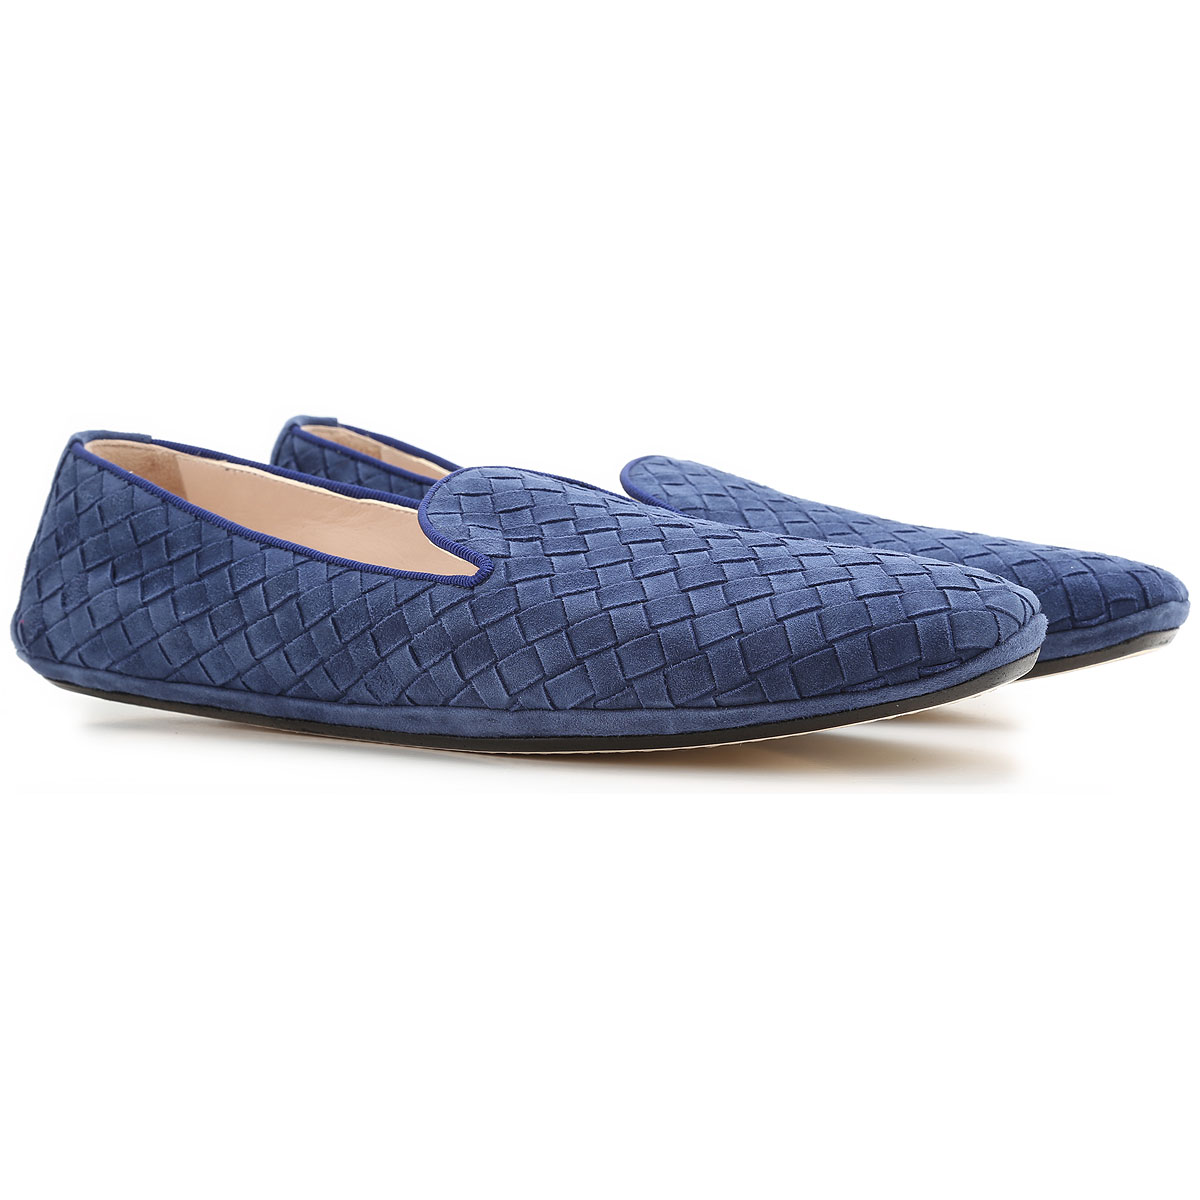 Image of Bottega Veneta Slip on Sneakers for Women On Sale, Pacific Blue, suede, 2017, 8 8.5 9.5